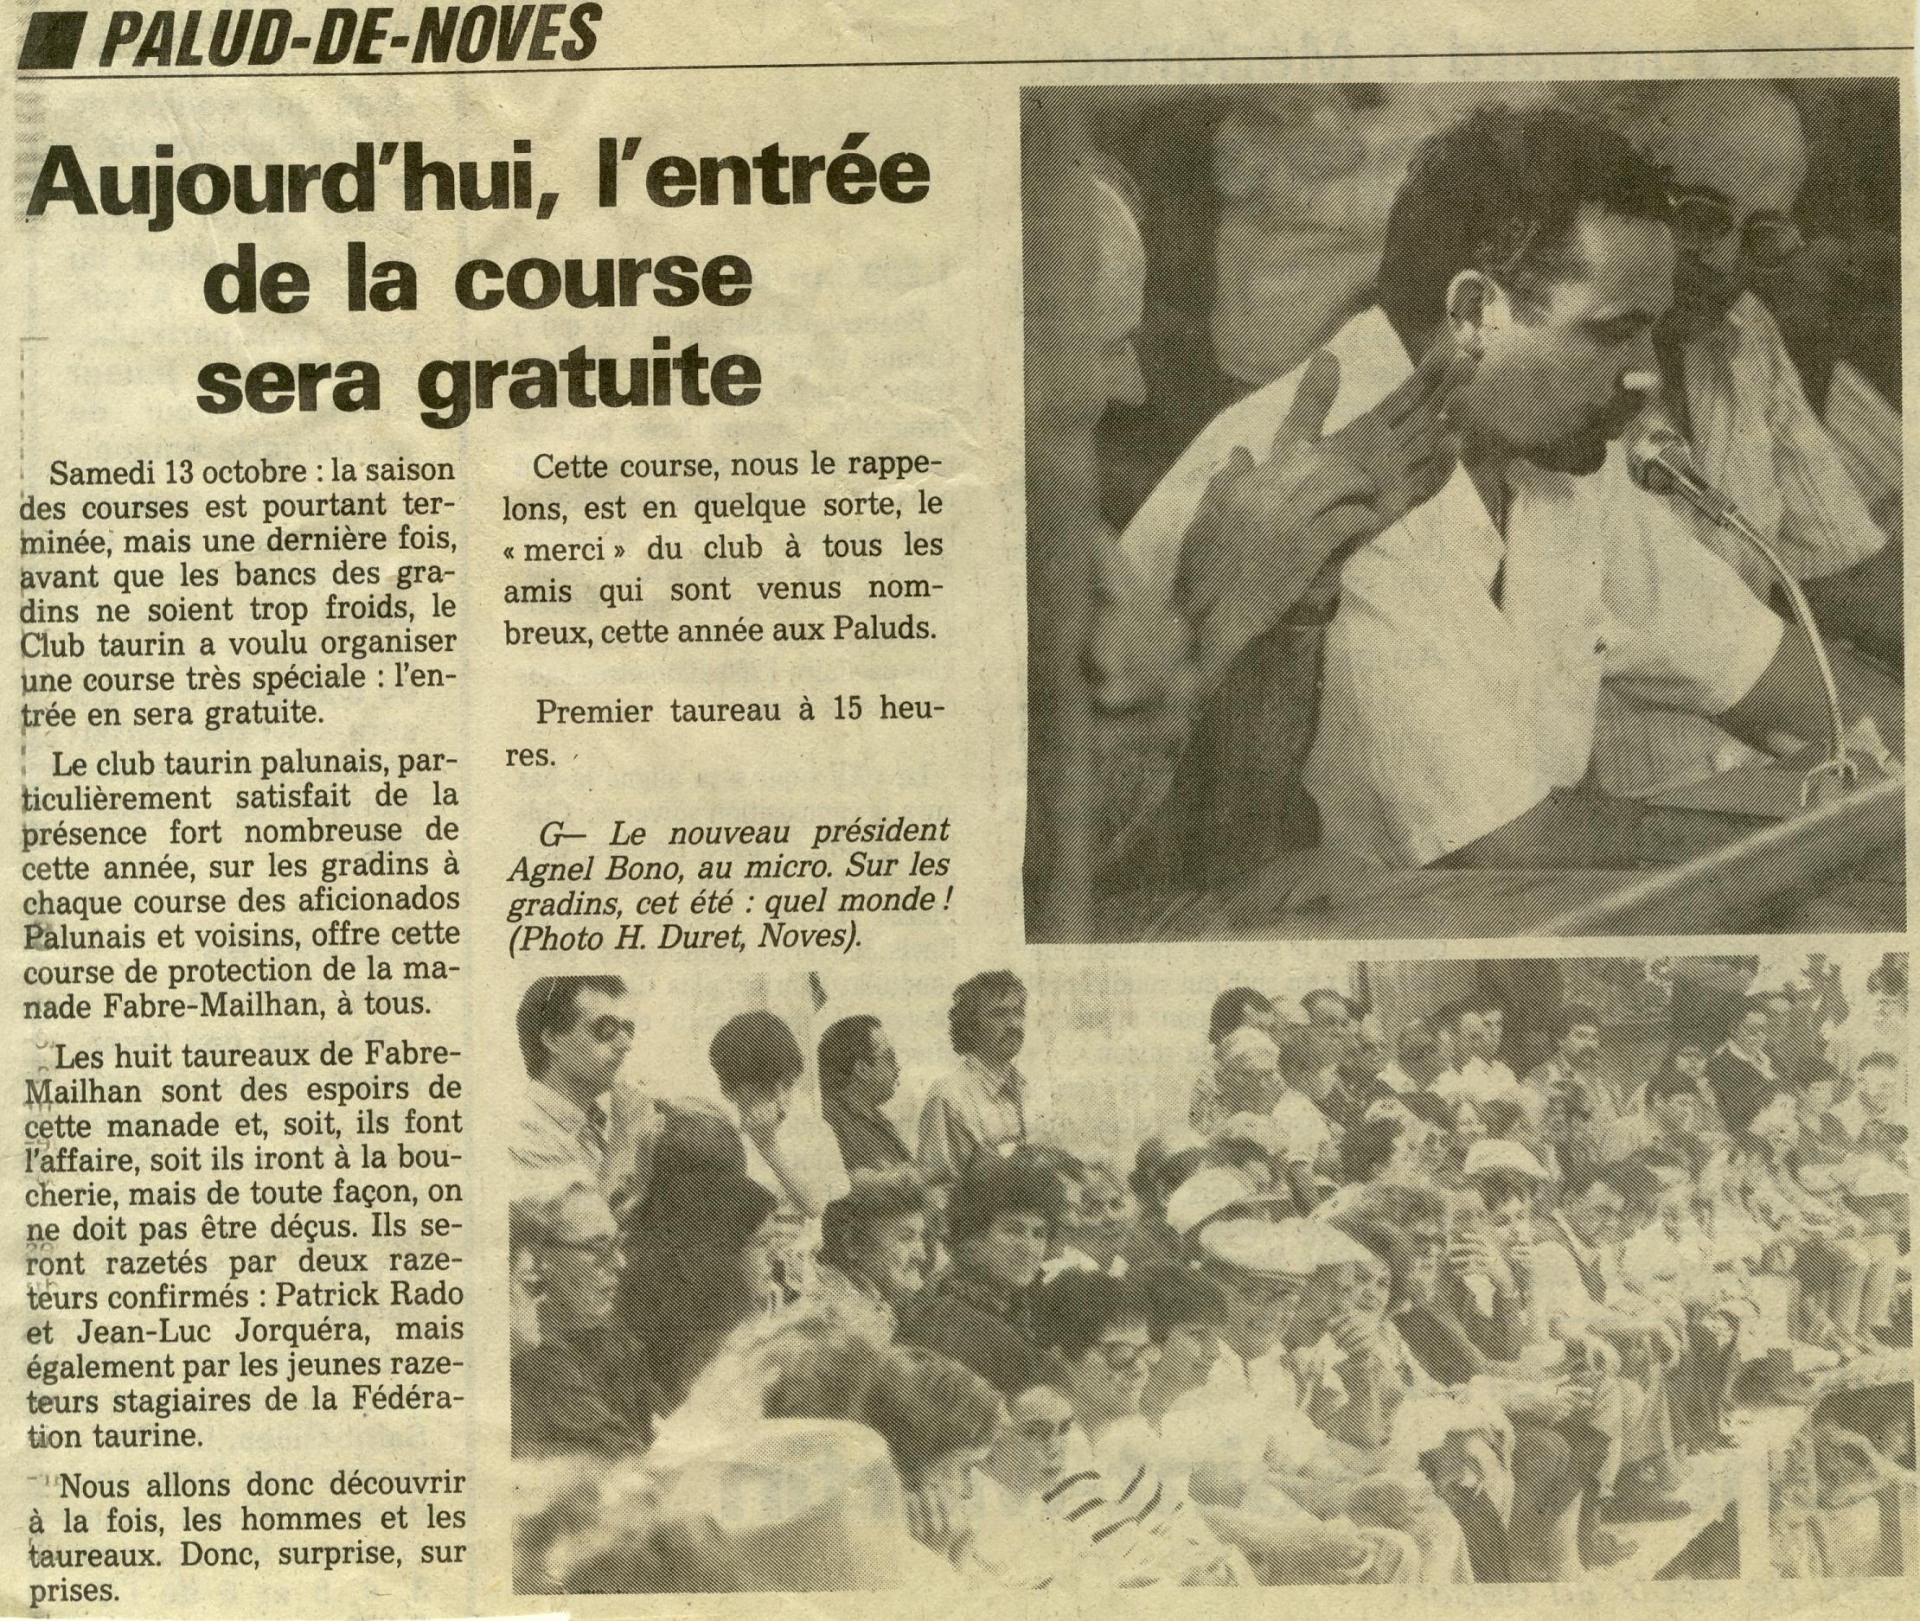 Course gratuite 1989